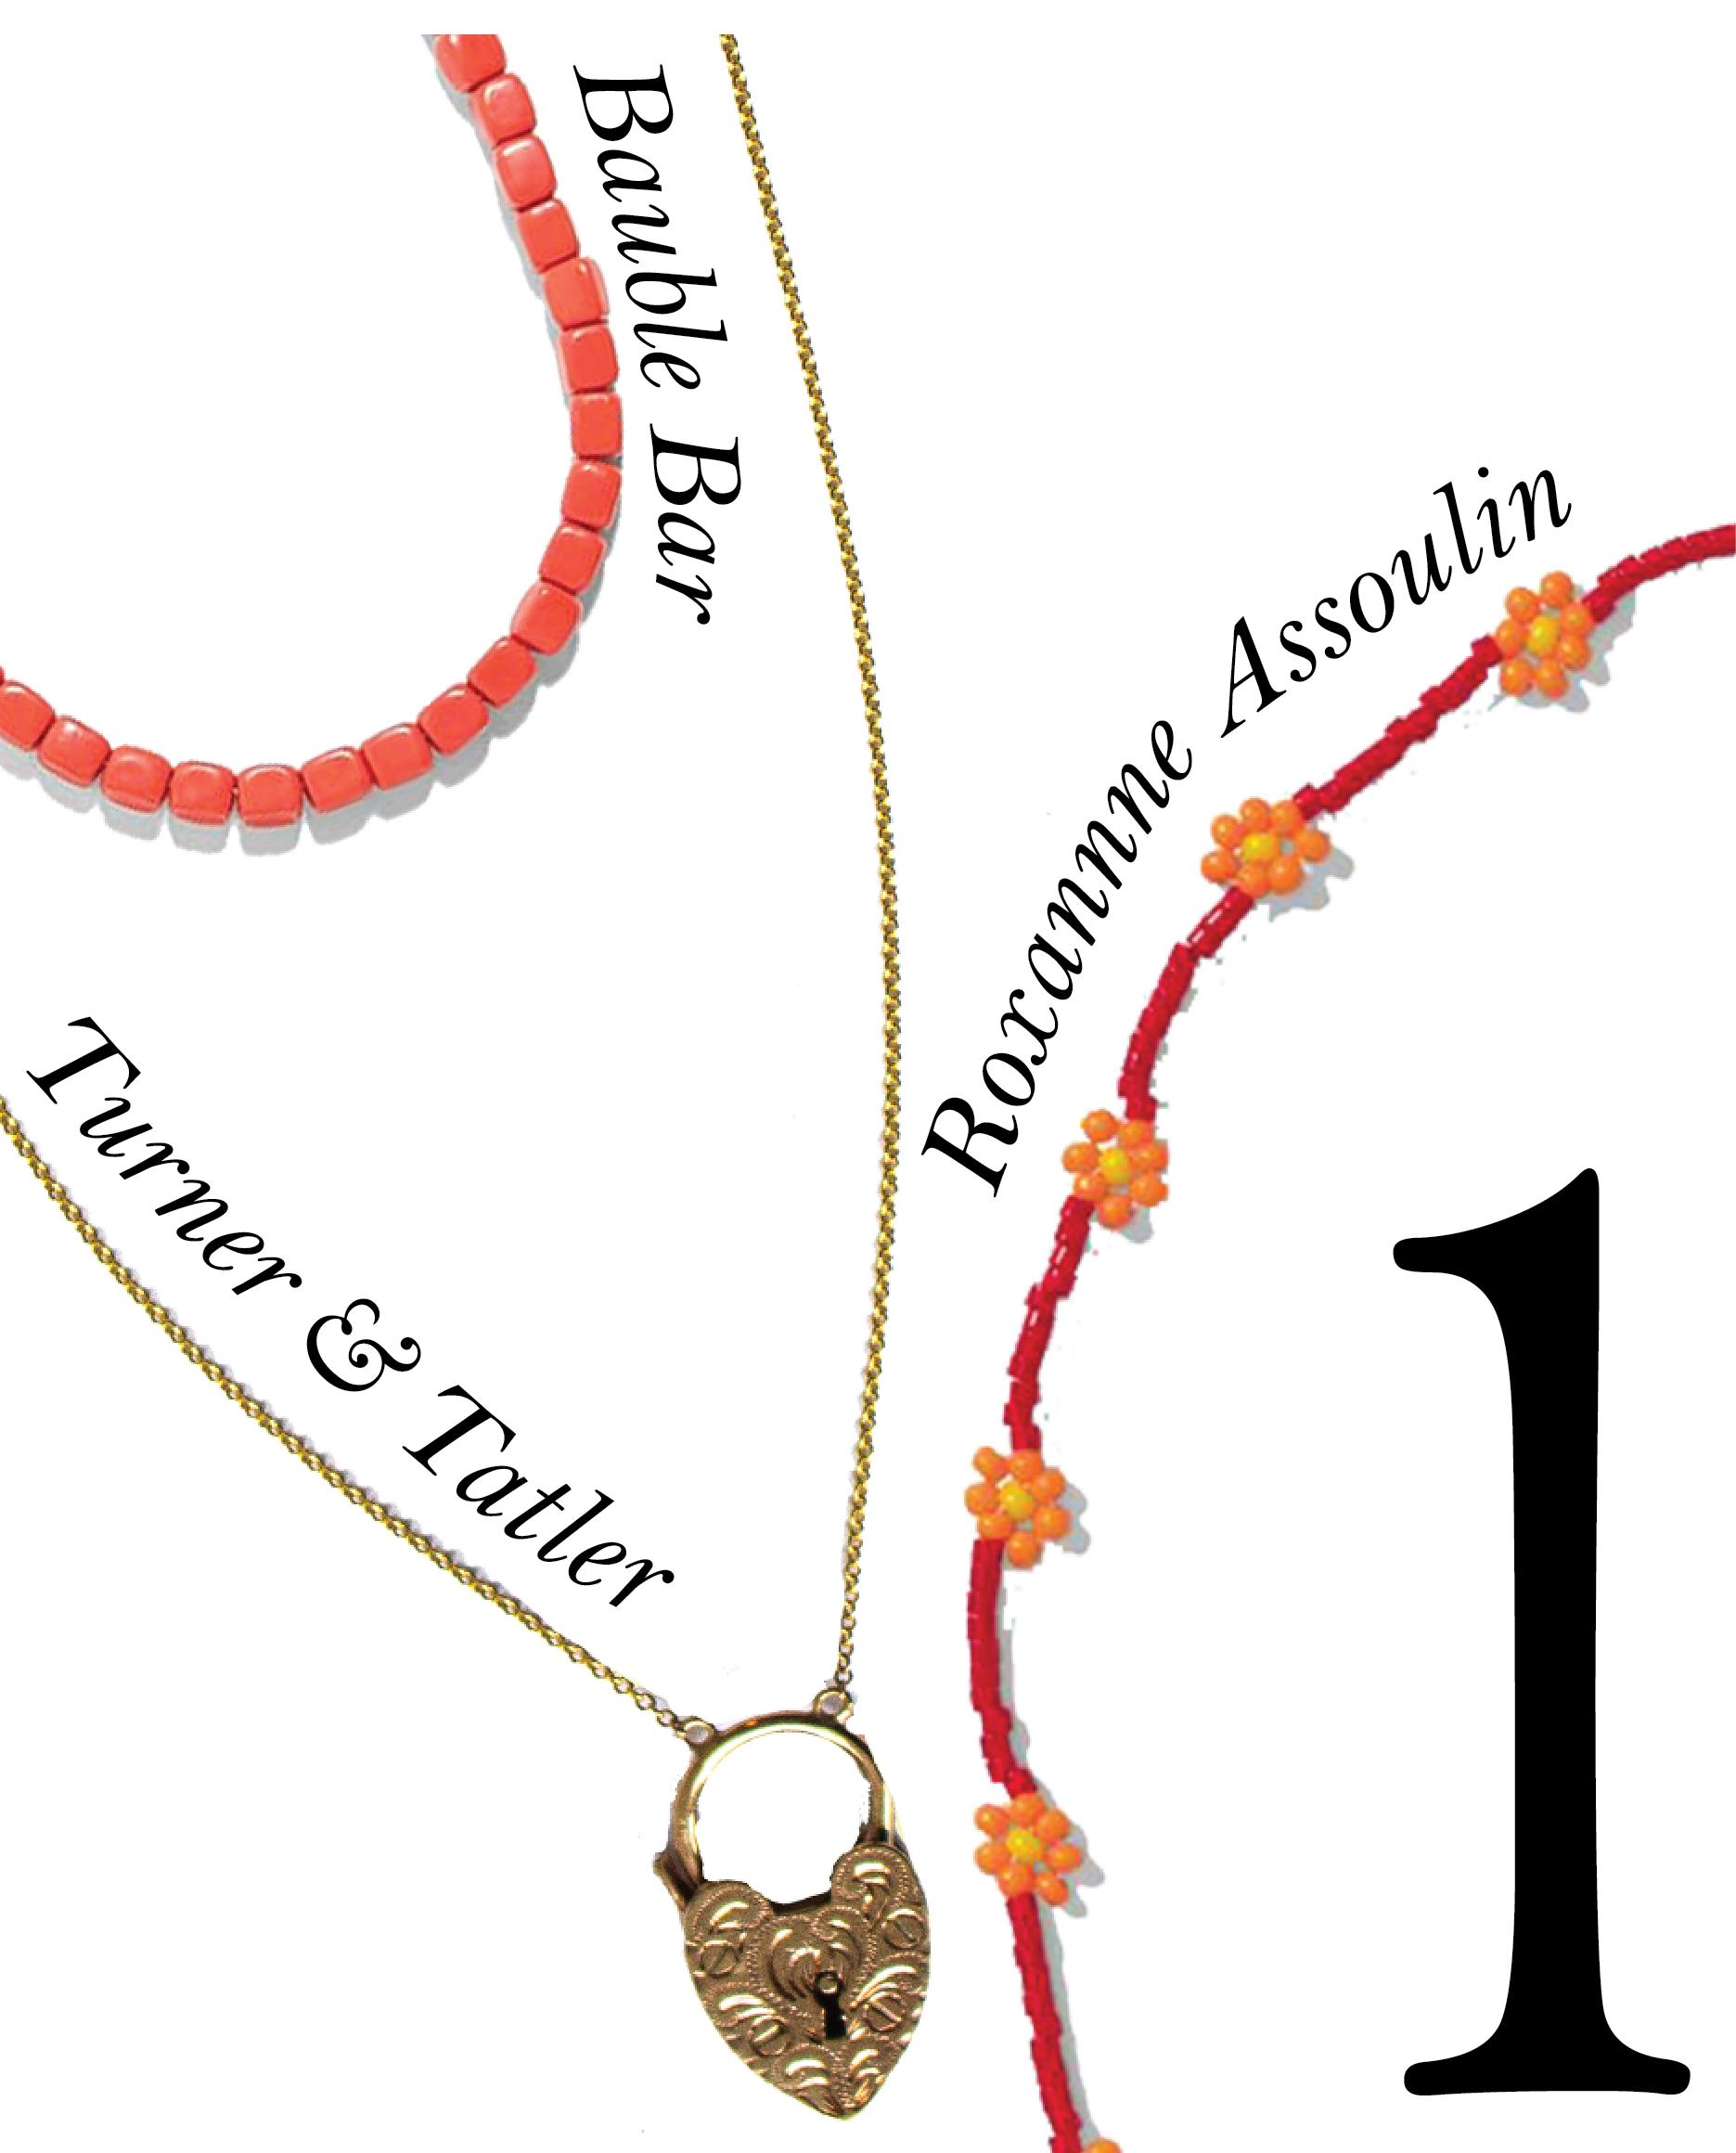 LOOK-summer-necklaces-jvbcom.png